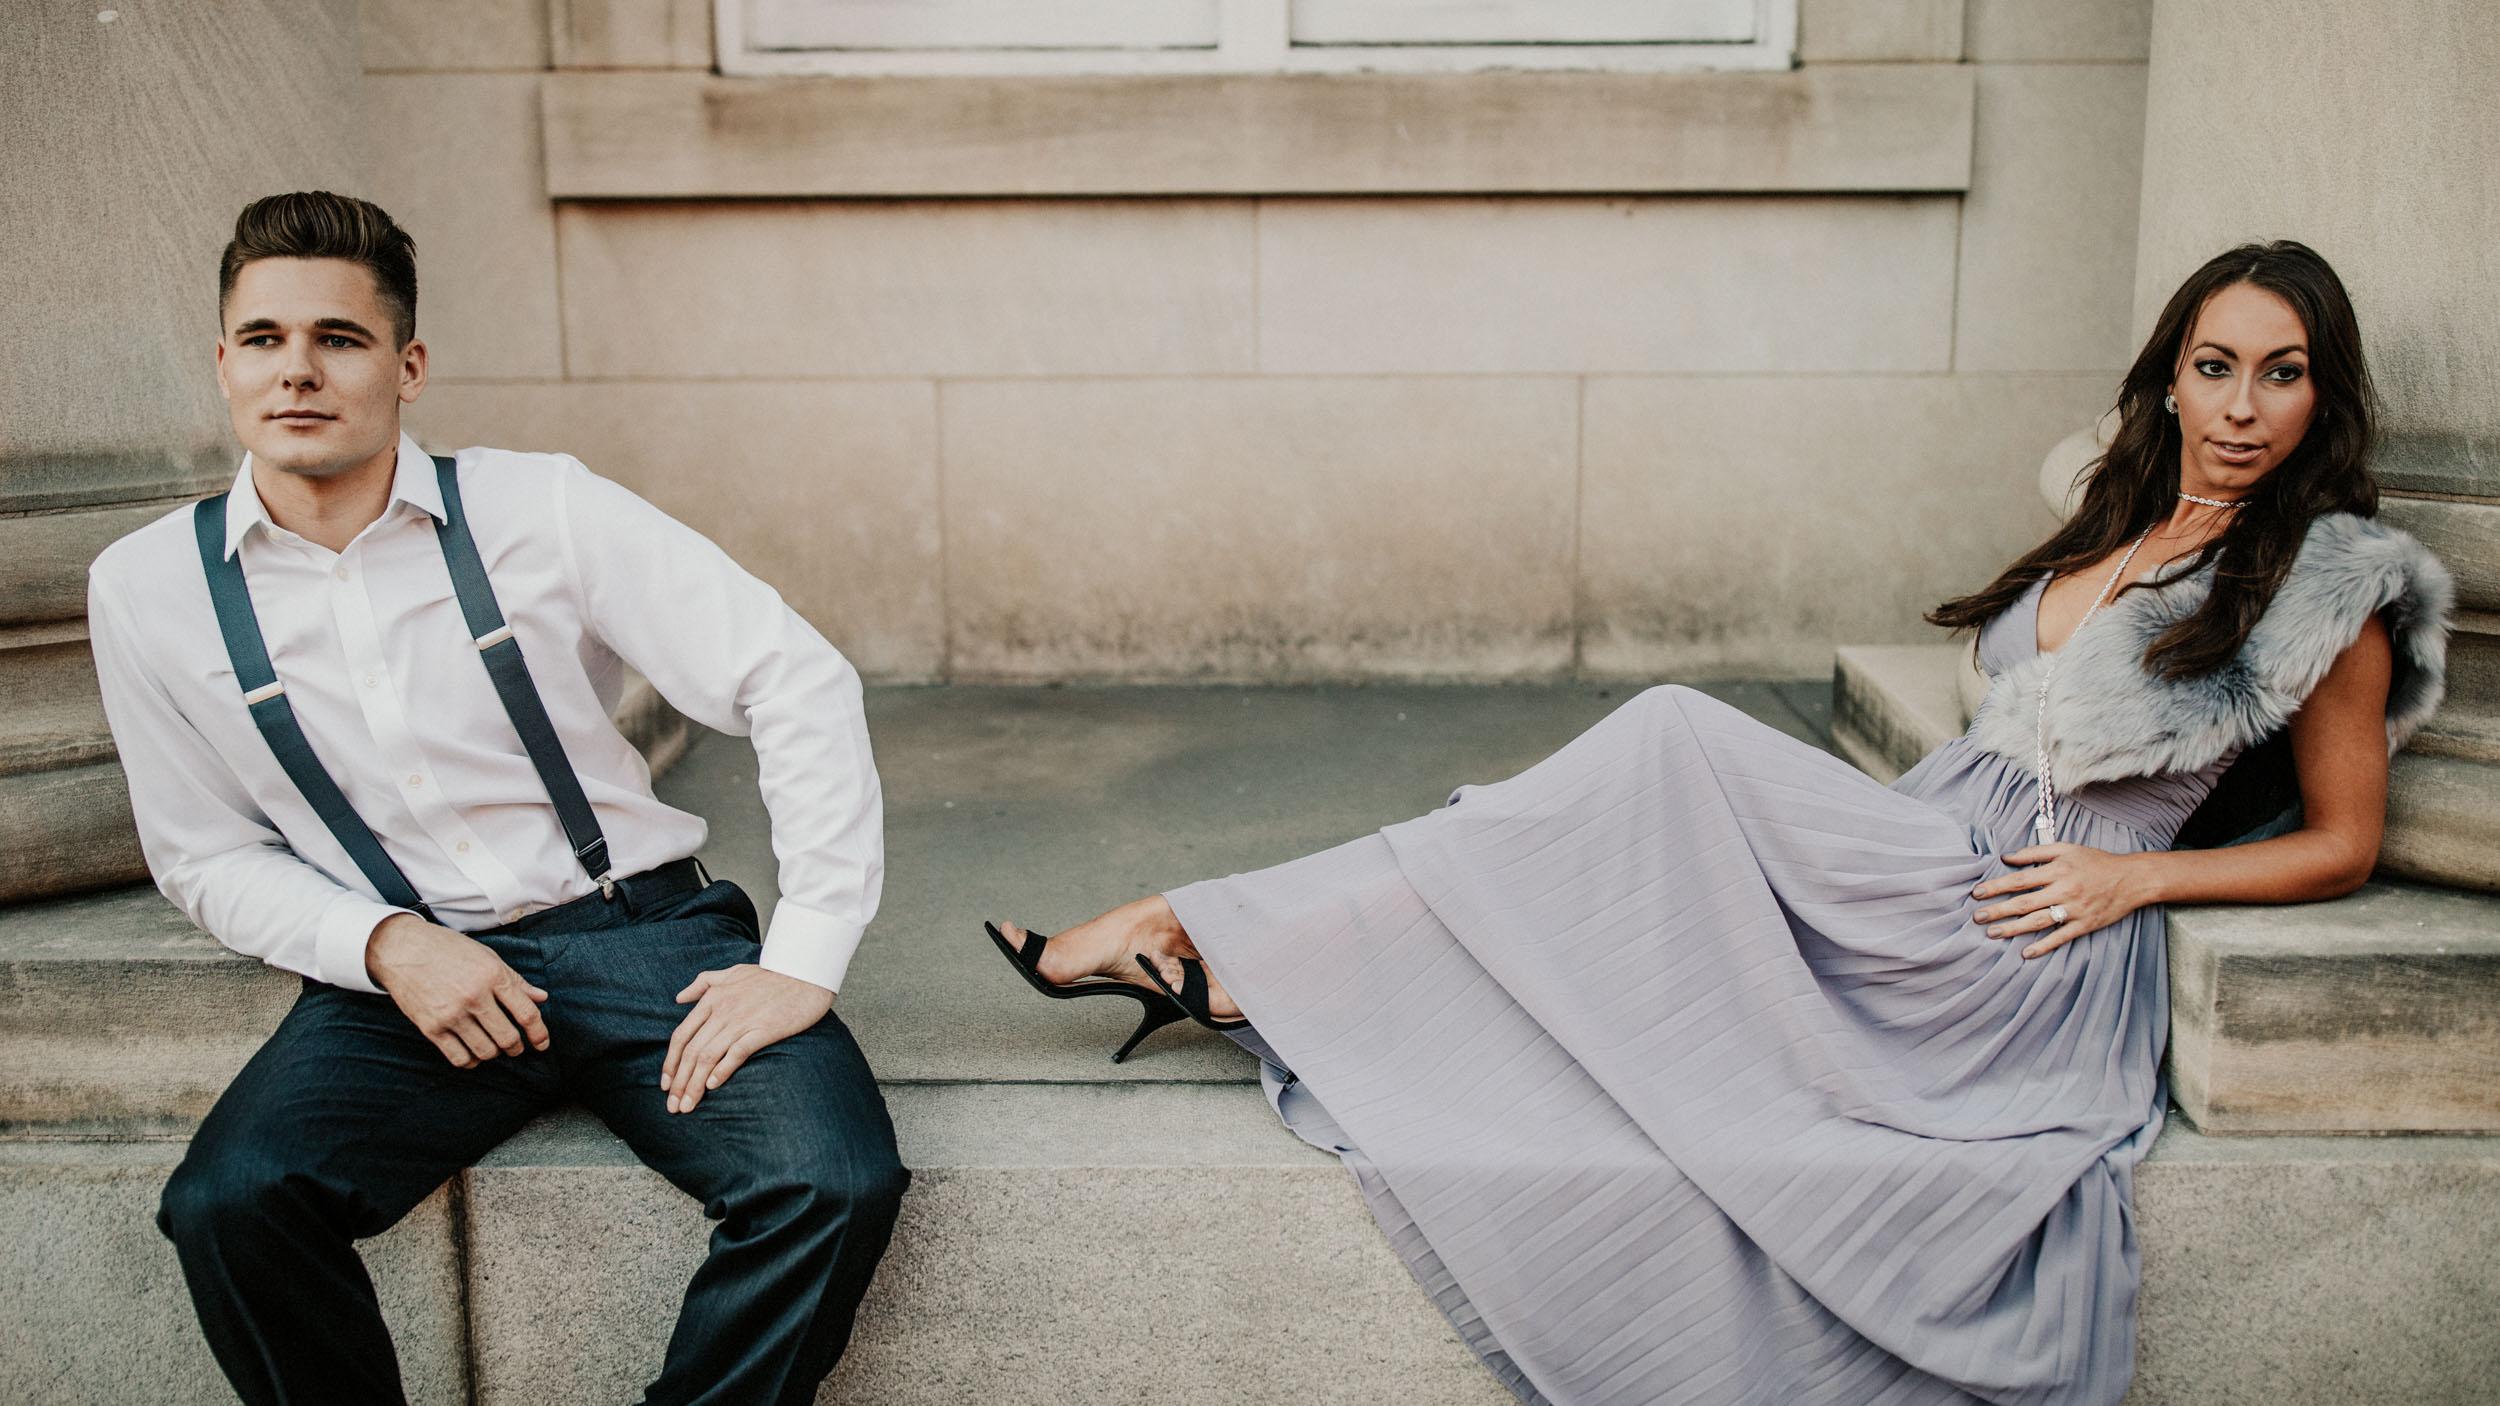 durham nc professional wedding photographers